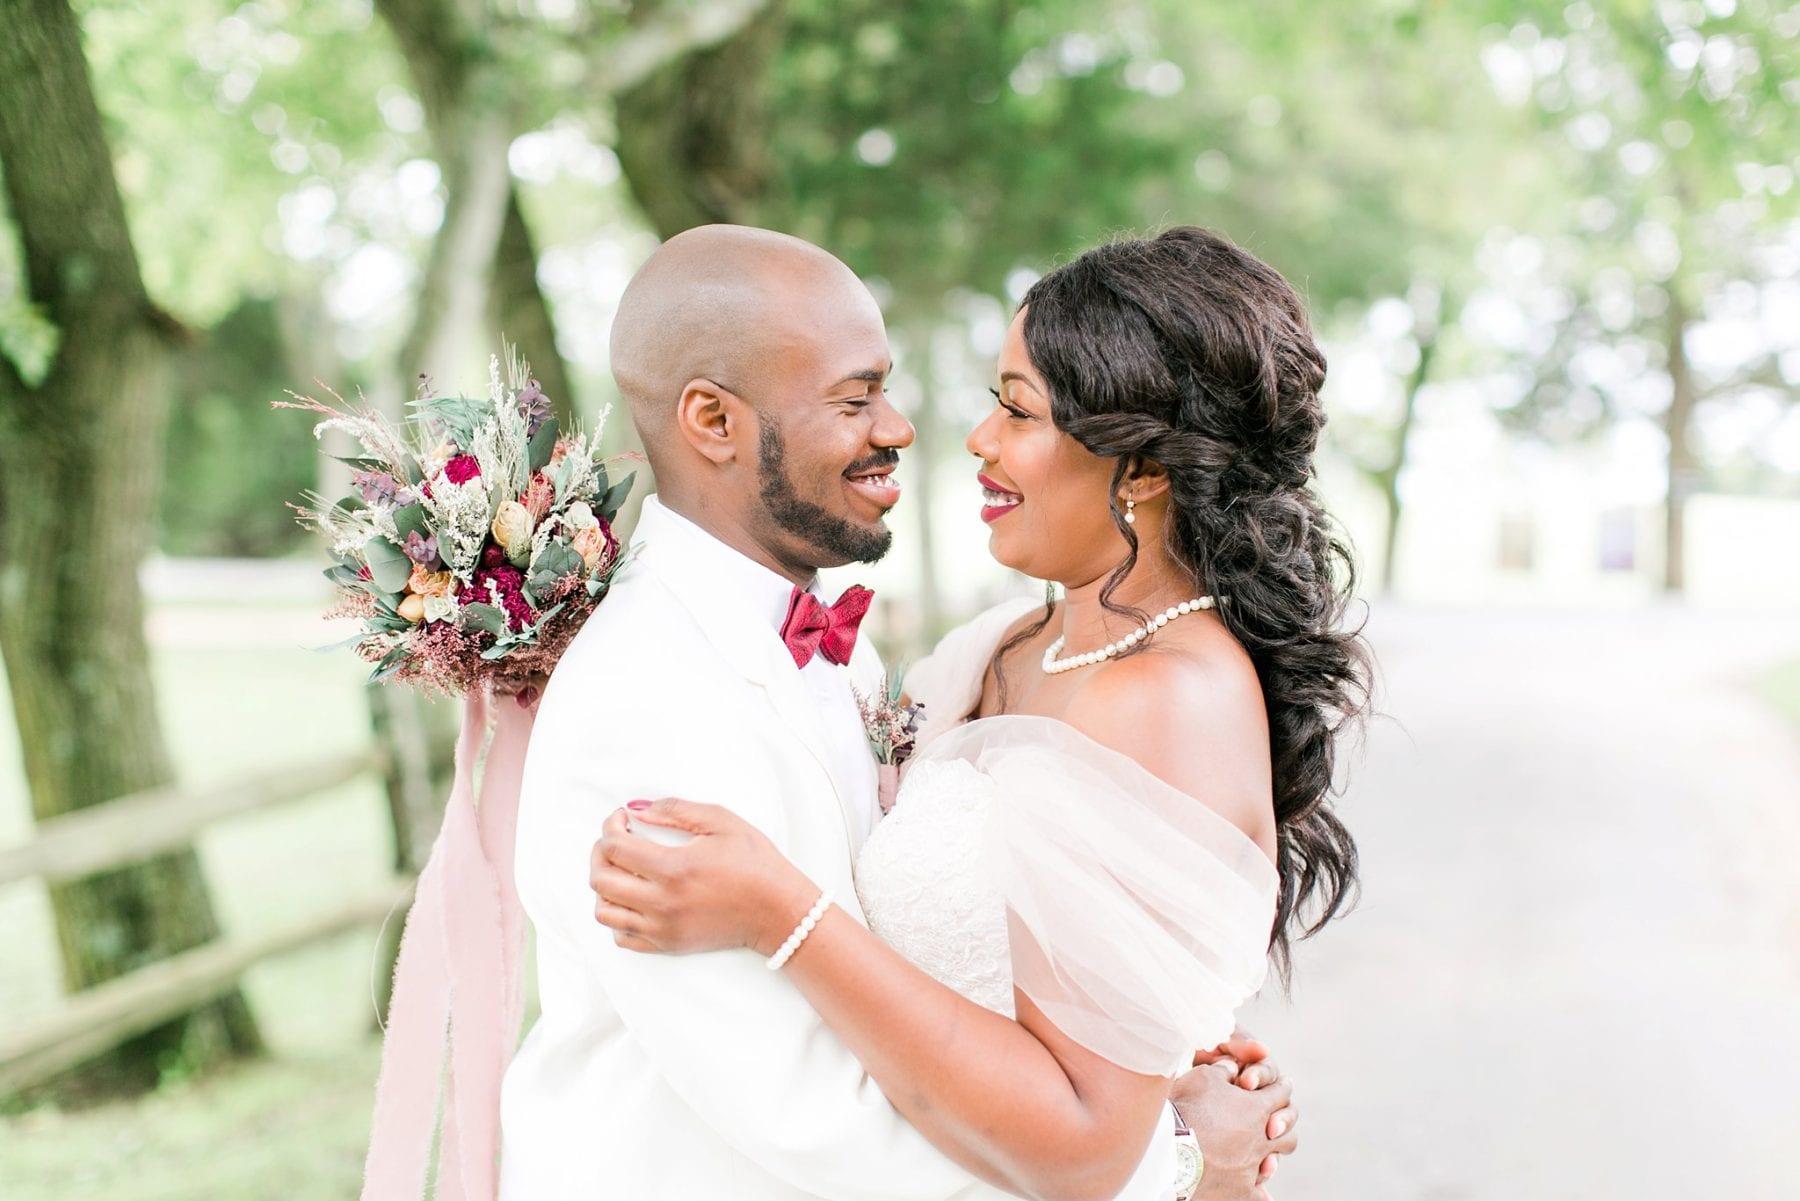 Jefferson Patterson Park Wedding Maryland Wedding Photographer Megan Kelsey Photography Jasmine & Seyi-43.jpg